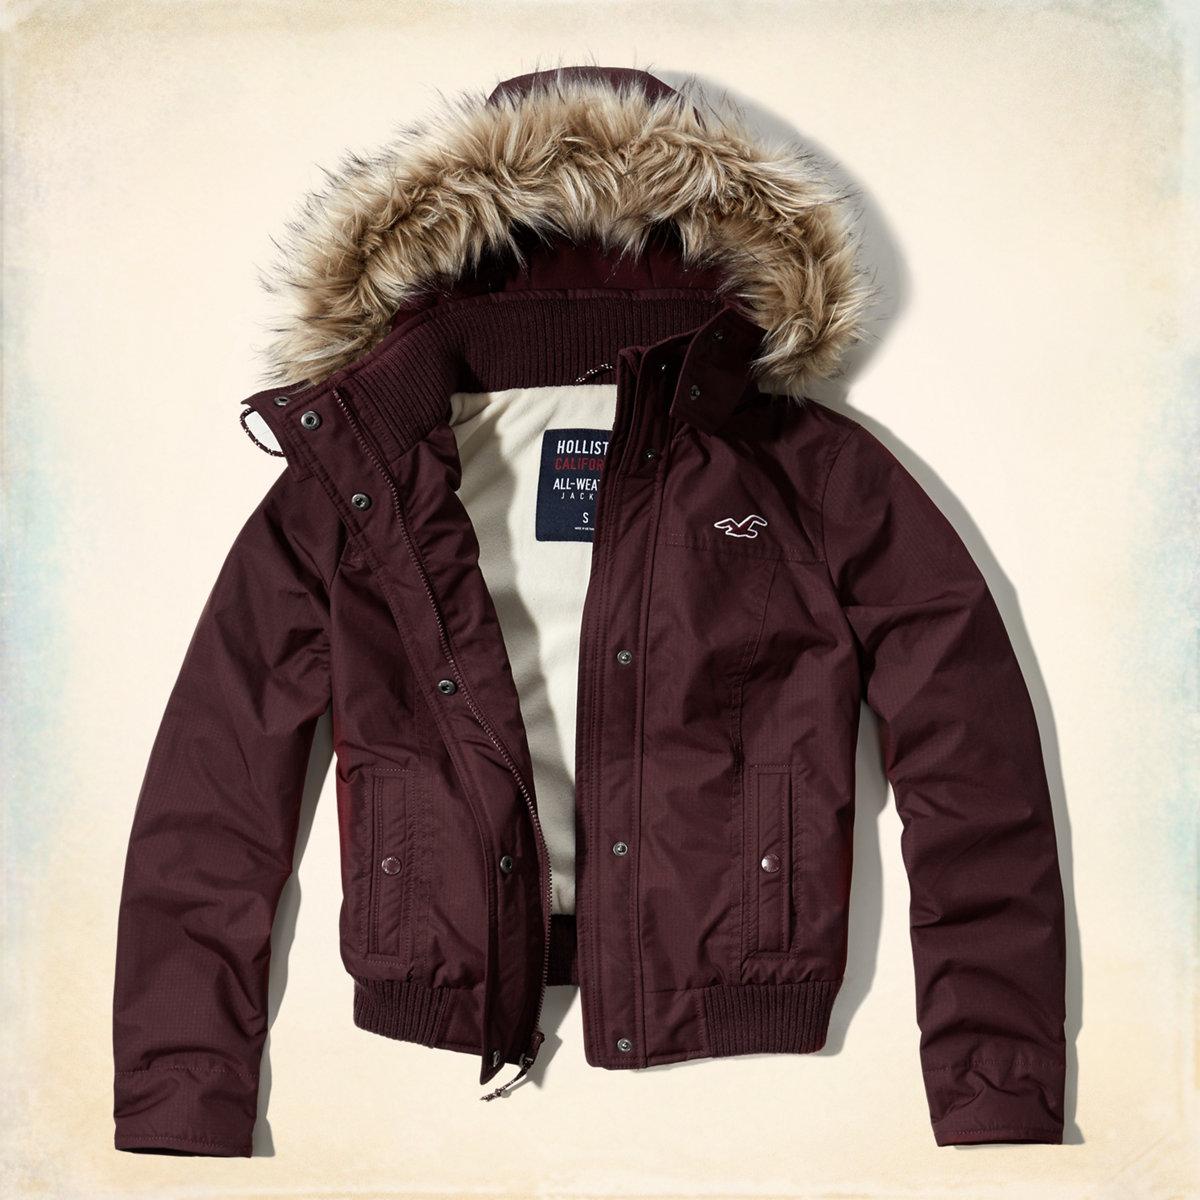 Hollister All-Weather Bomber Jacket